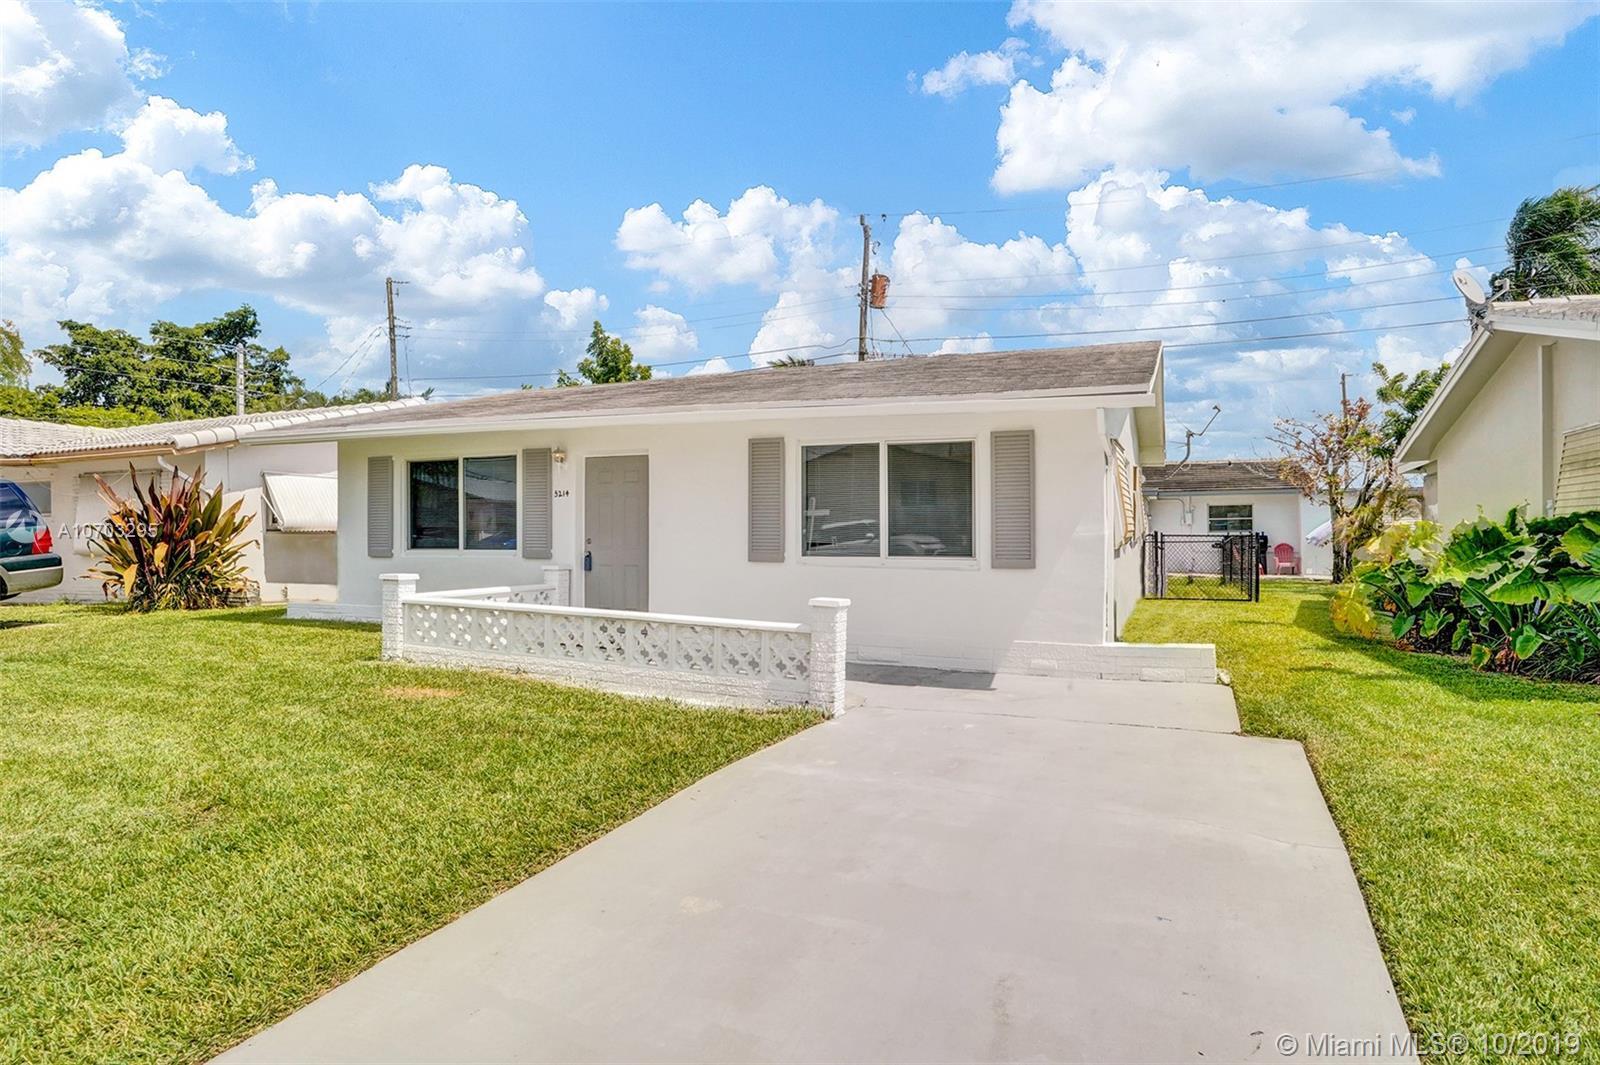 Property for sale at 5214 NW 27th Ave, Tamarac FL 33309, Tamarac,  Florida 33309